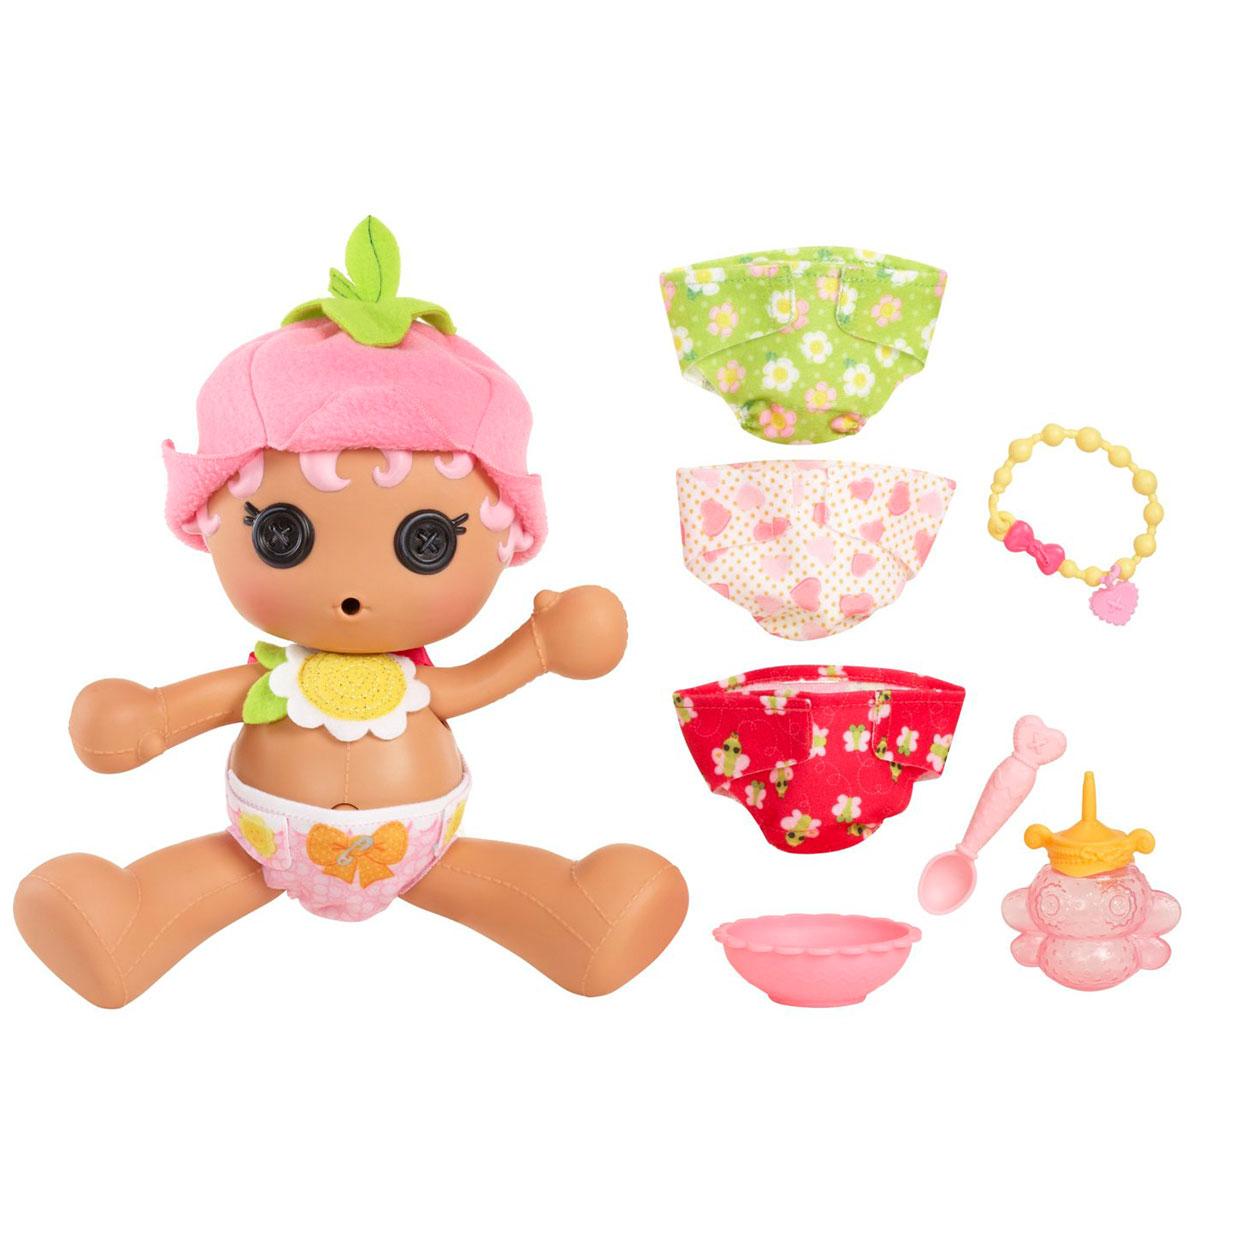 Lalaloopsy Babies Diaper Surprise Blossom Flowerpot Lalaloopsy Lalaloopsy Dolls Baby Diapers